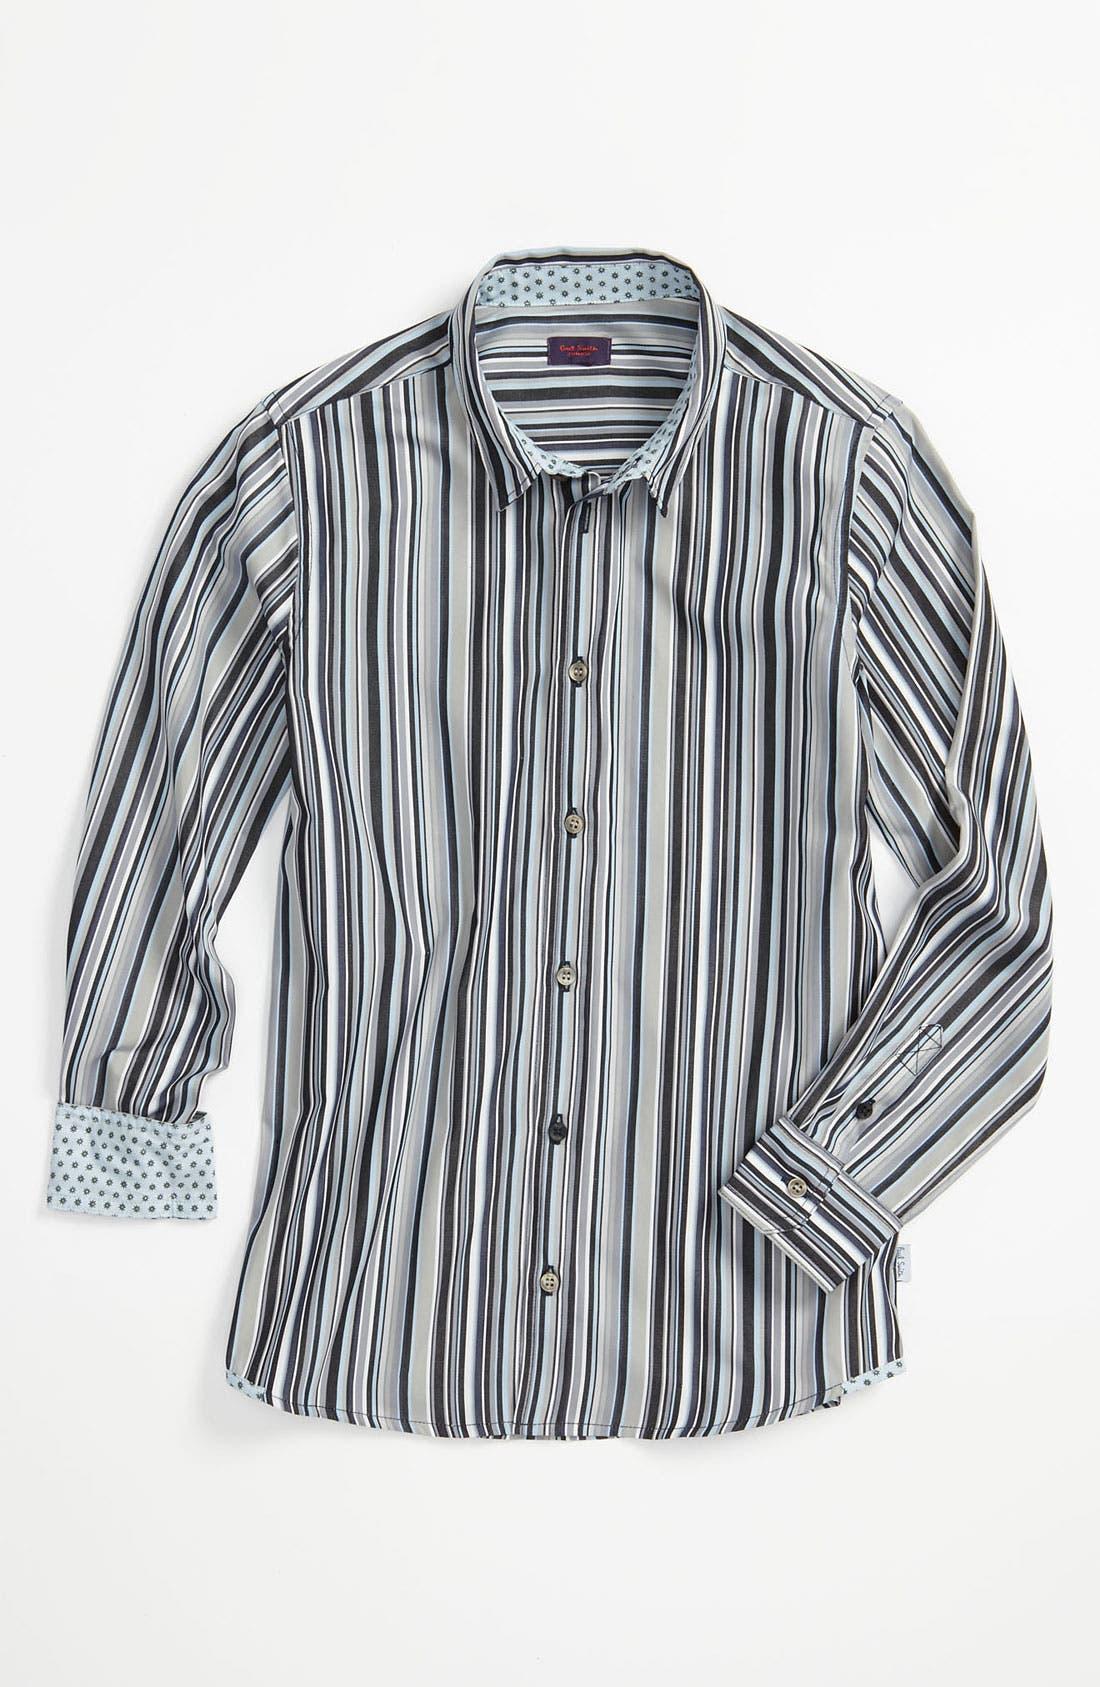 Alternate Image 1 Selected - Paul Smith Junior 'Cartland' Woven Shirt (Big Boys)